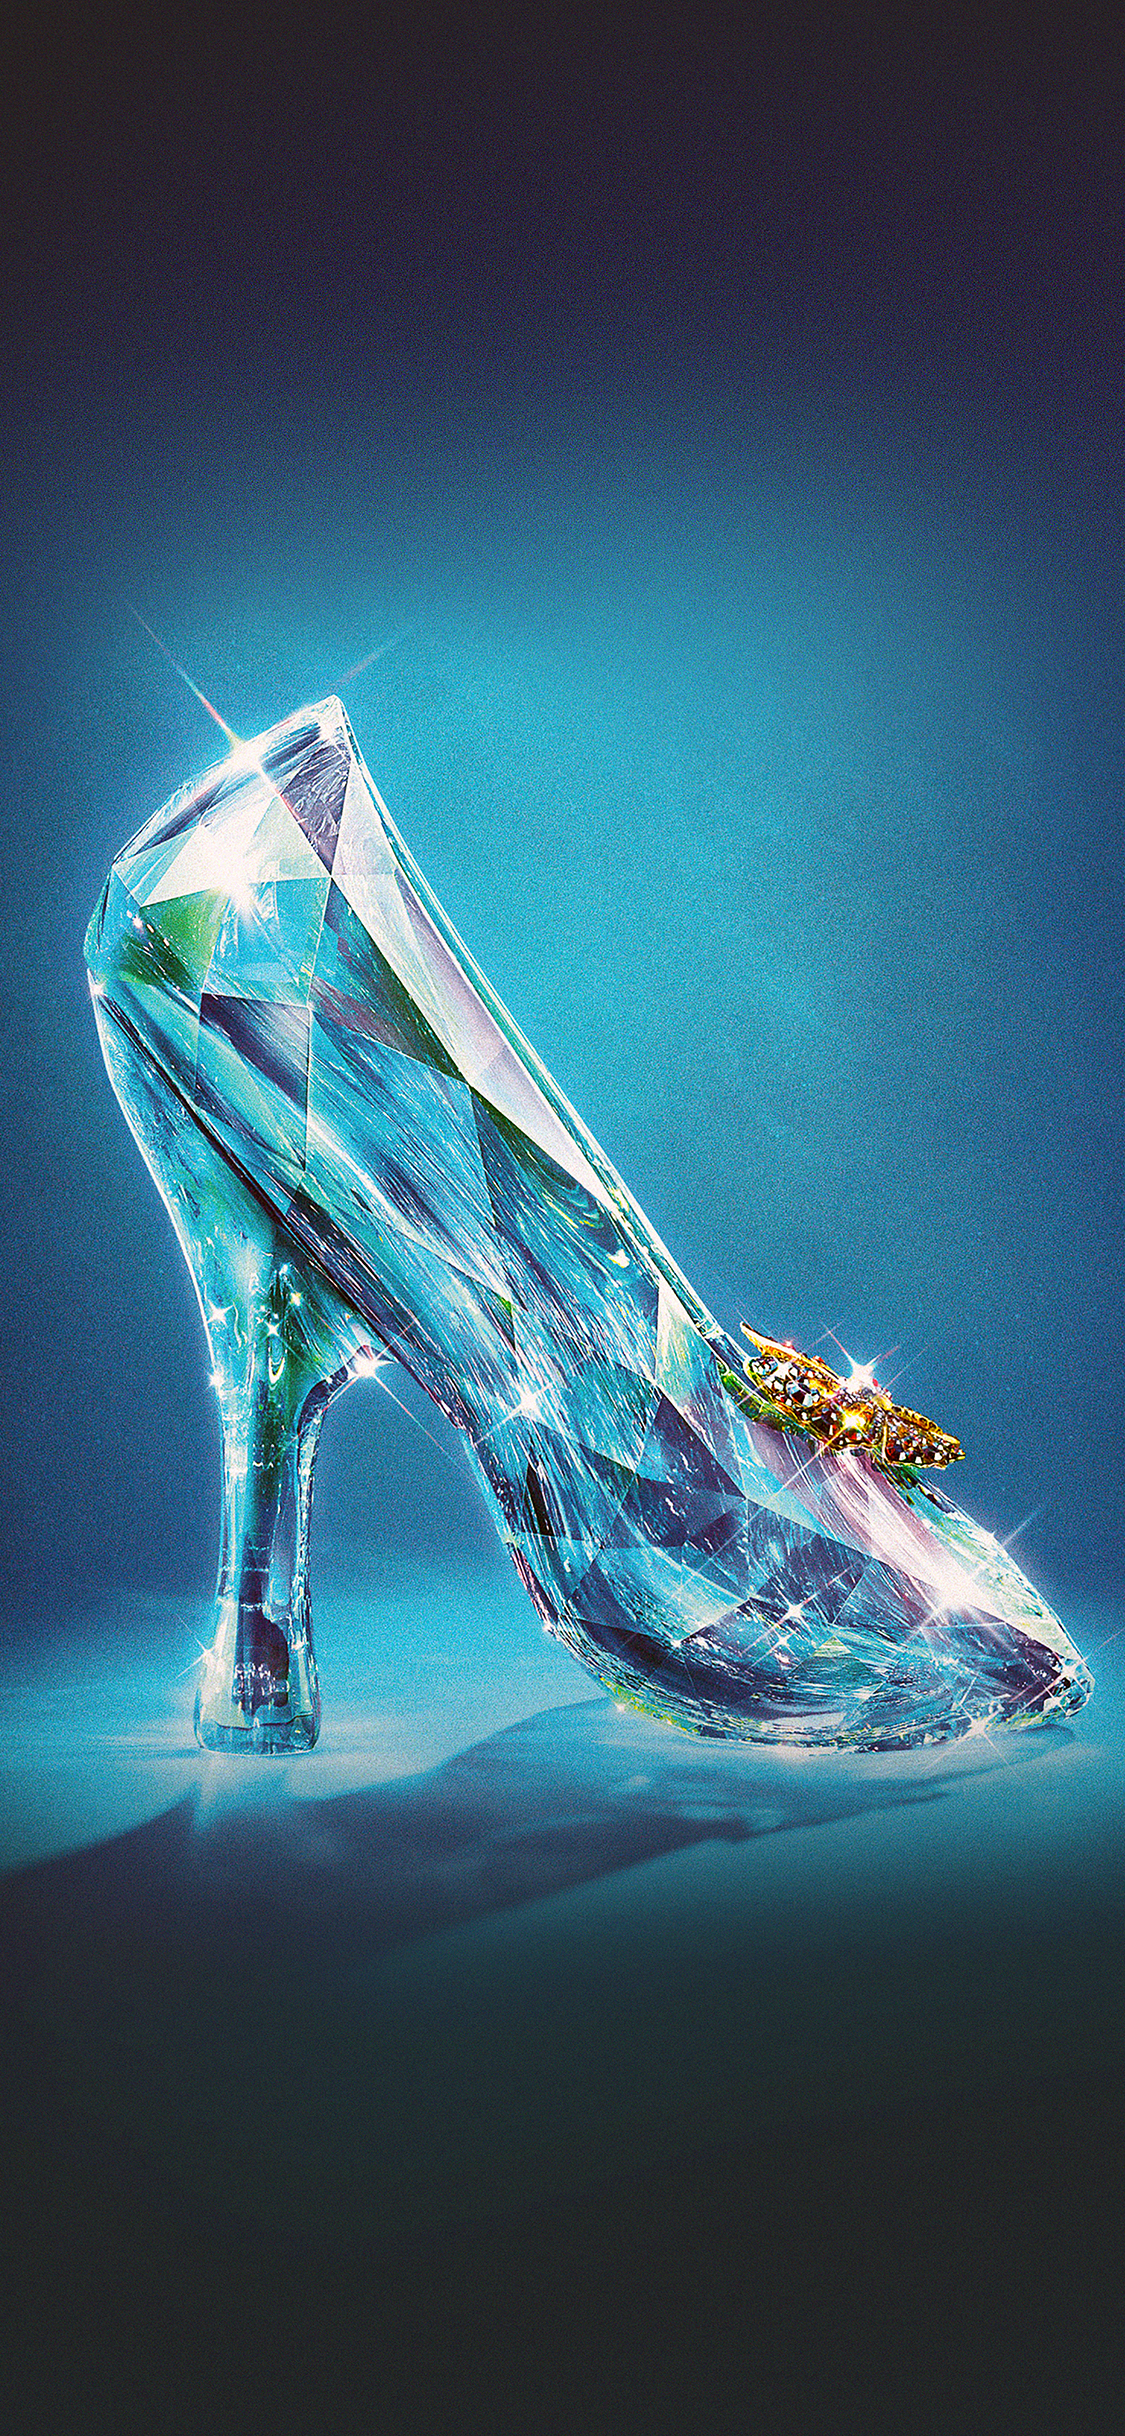 iPhoneXpapers.com-Apple-iPhone-wallpaper-ac04-wallpaper-cinderella-glass-slipper-shoes-illust